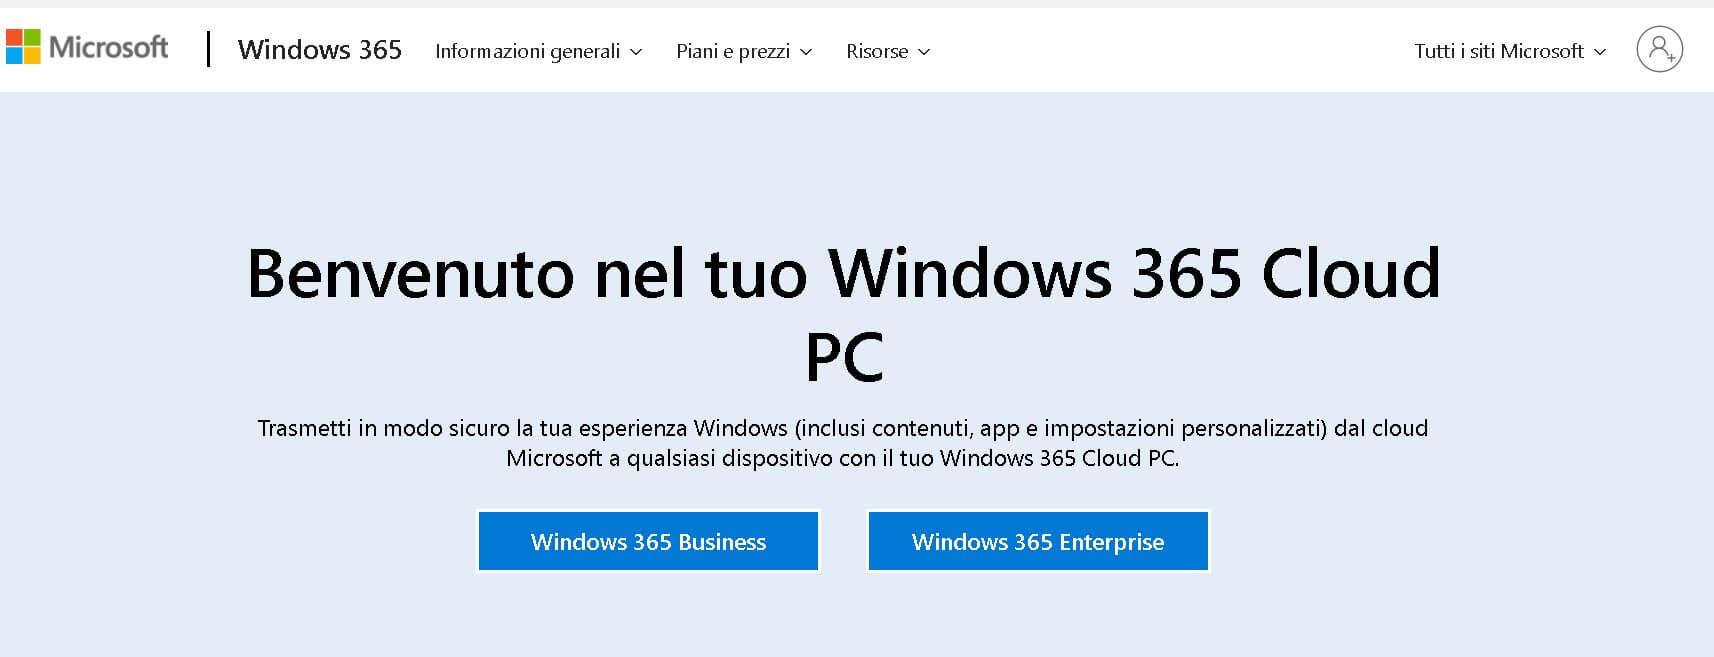 windows 365 -home page